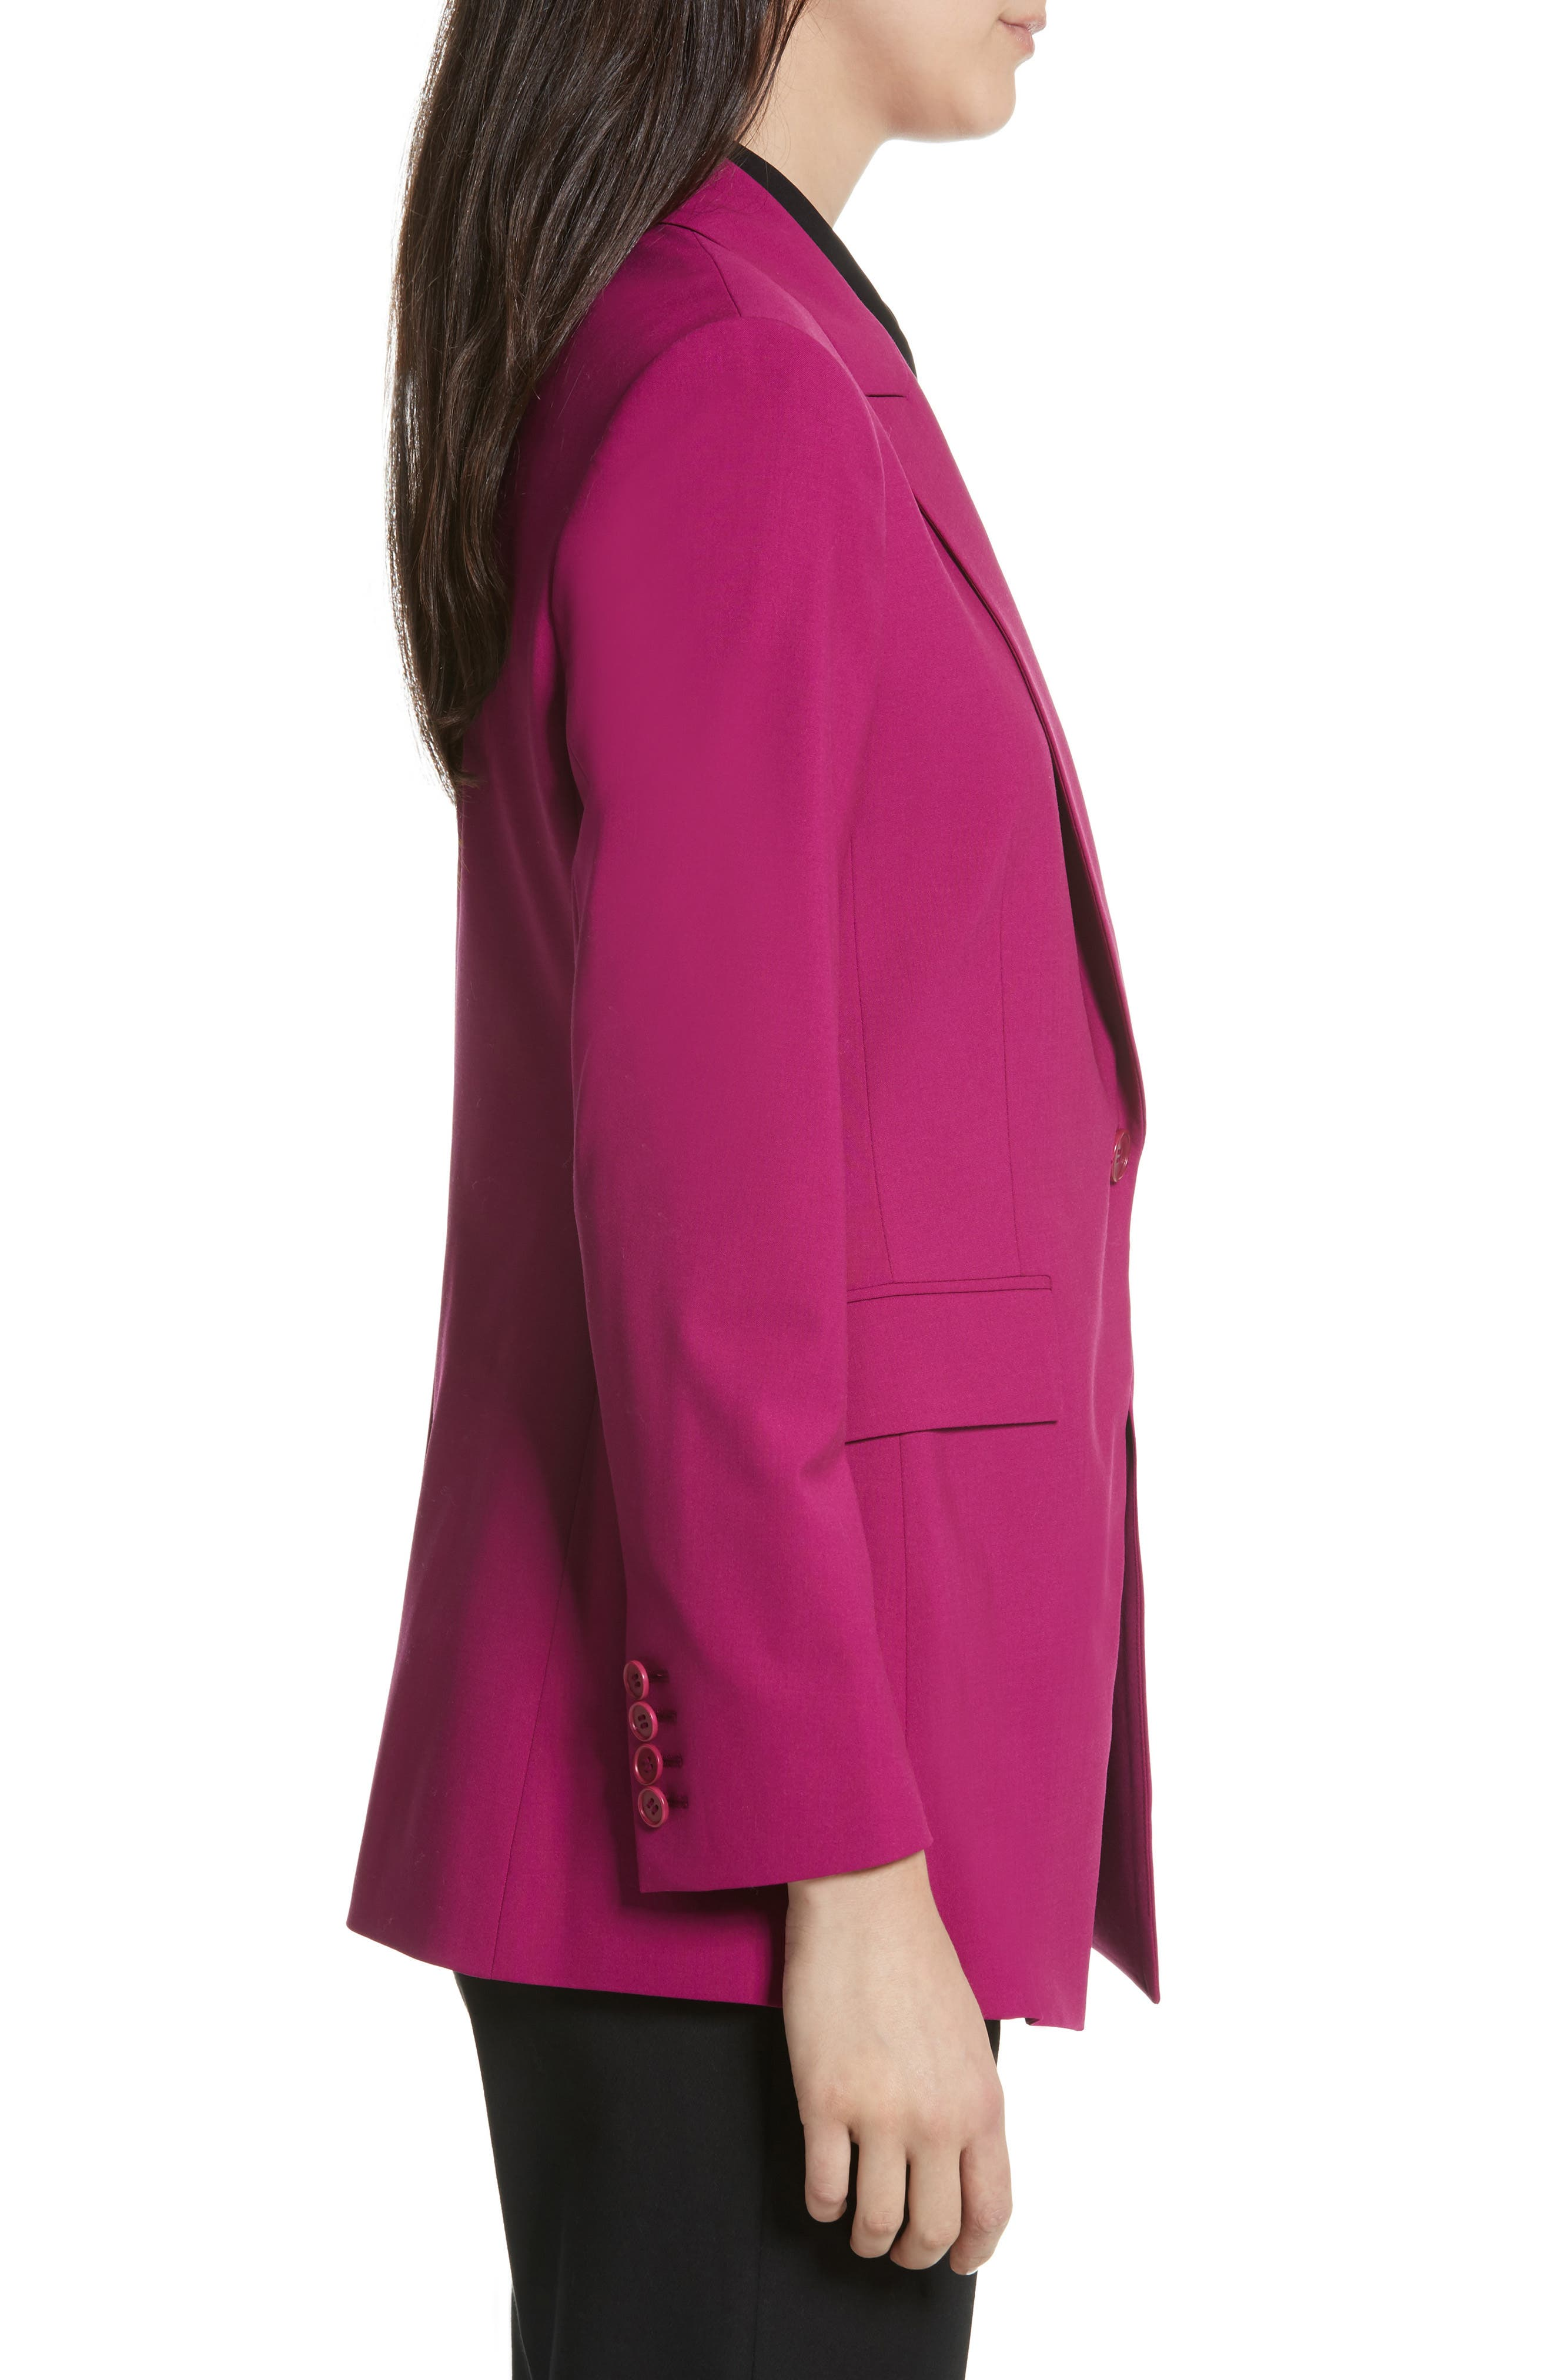 Etienette B Good Wool Suit Jacket,                             Alternate thumbnail 22, color,